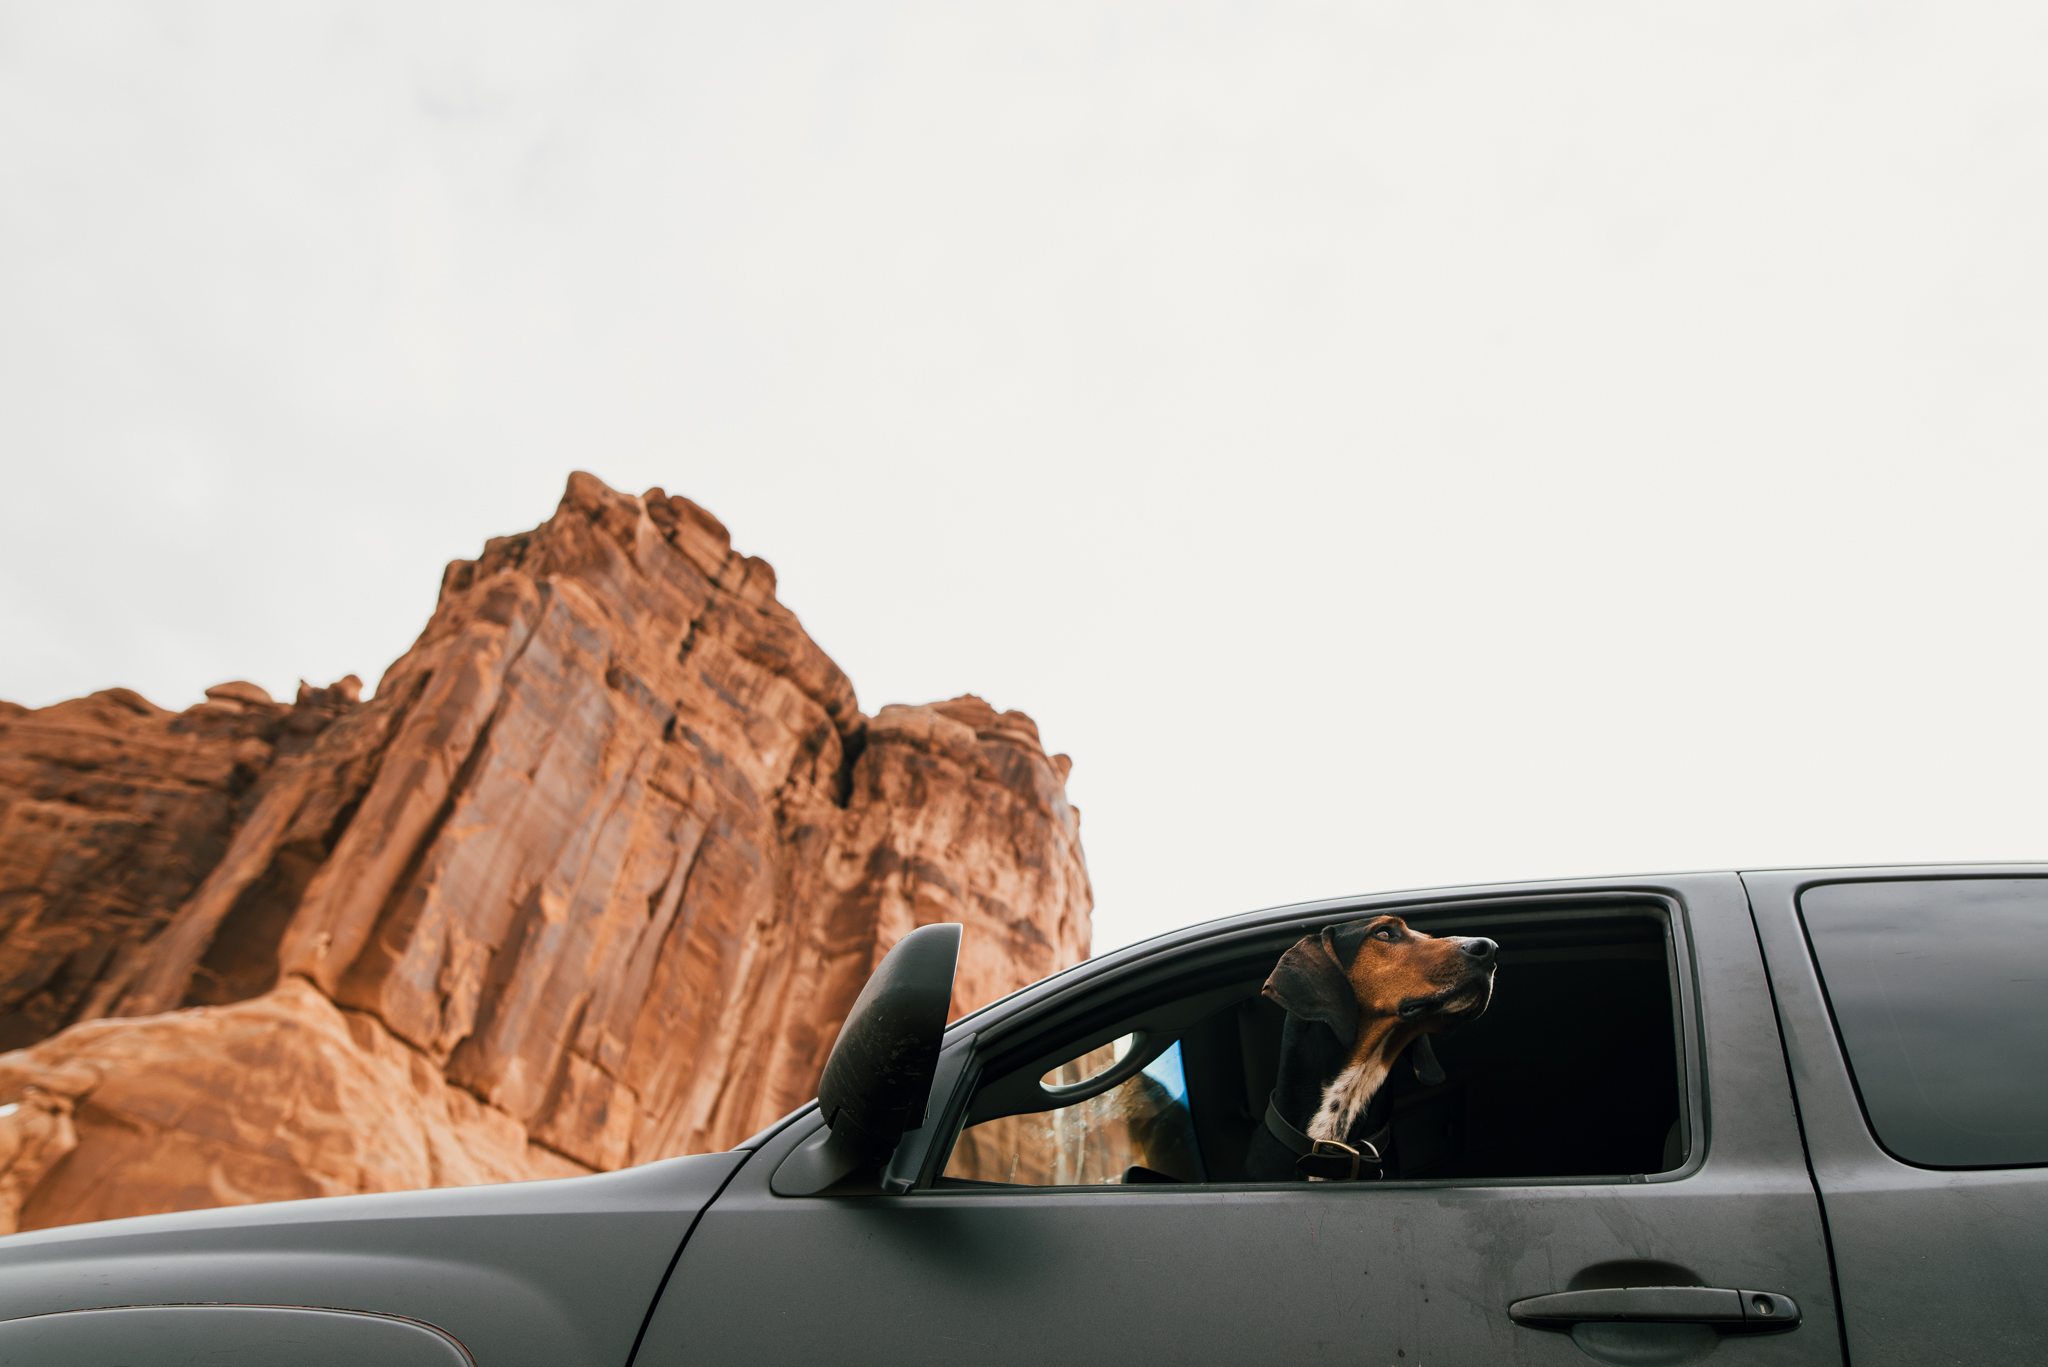 ©The-Ryans-Photography---Arches-National-Park-Moab-Utah-Travel-006.jpg